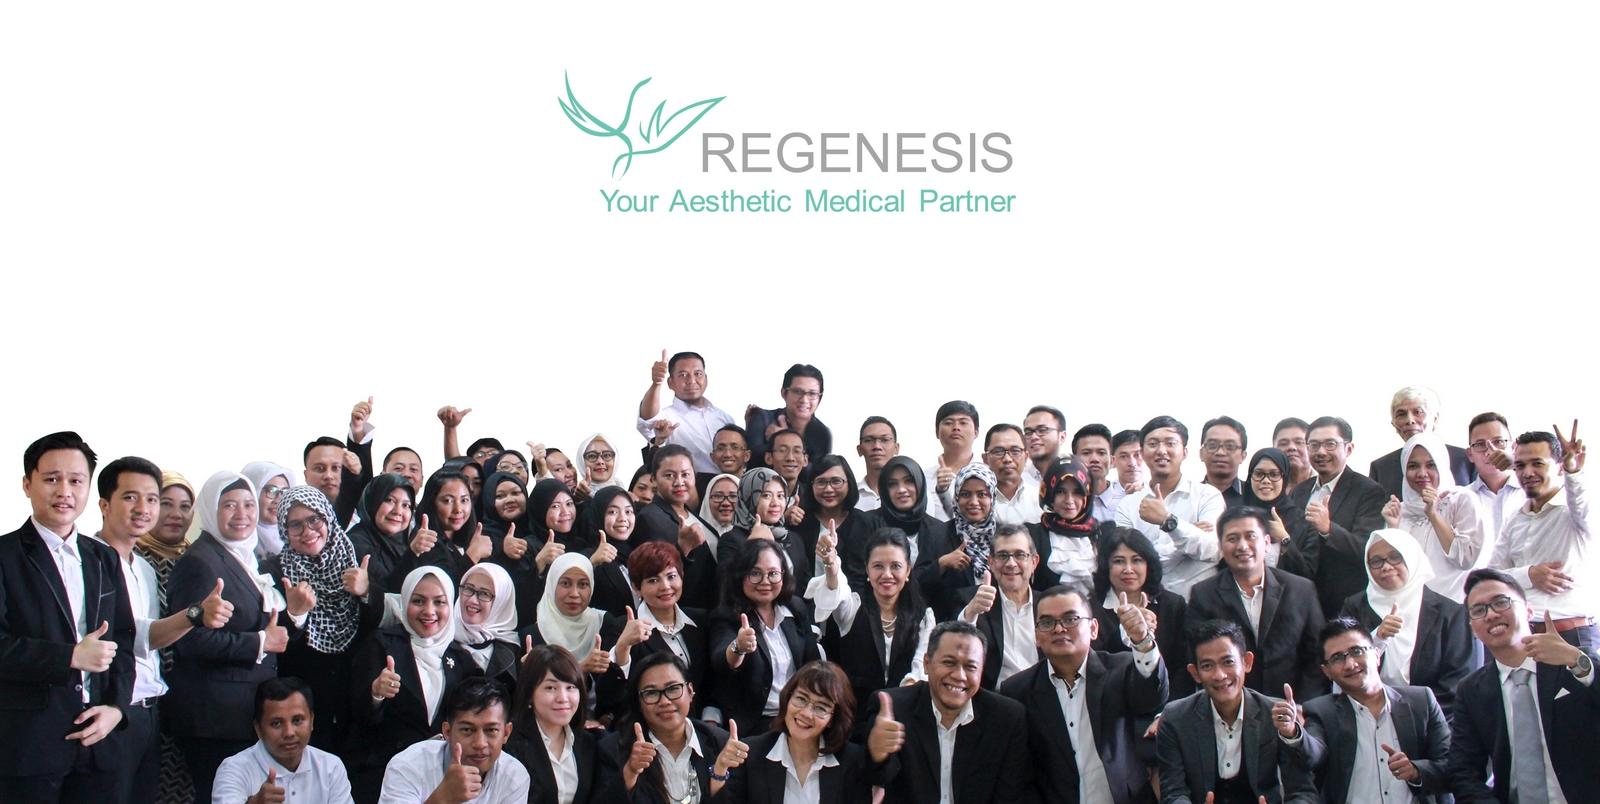 regenesis1 (small)